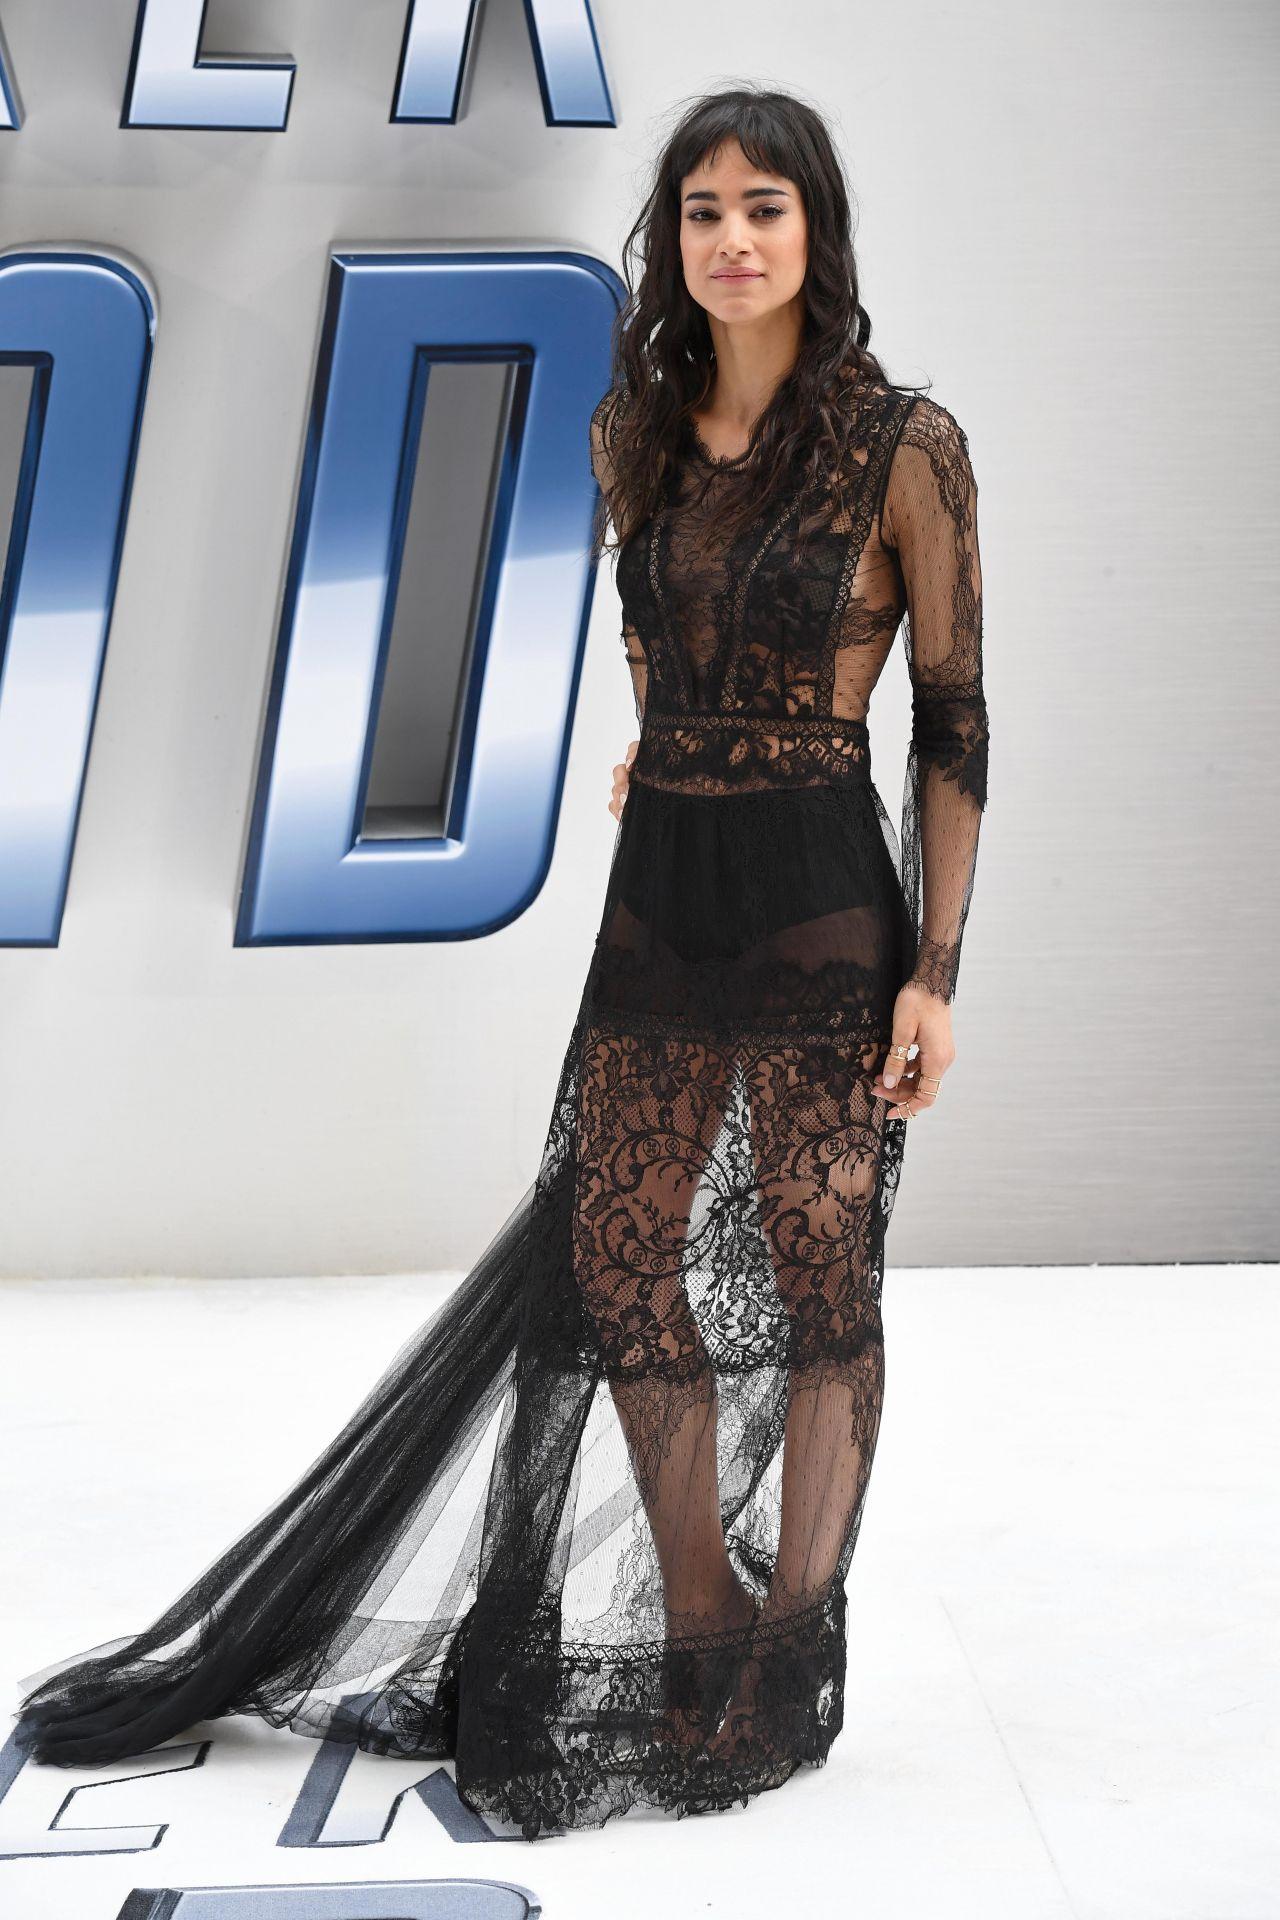 Sofia Boutella Star Trek Beyond Premiere In London